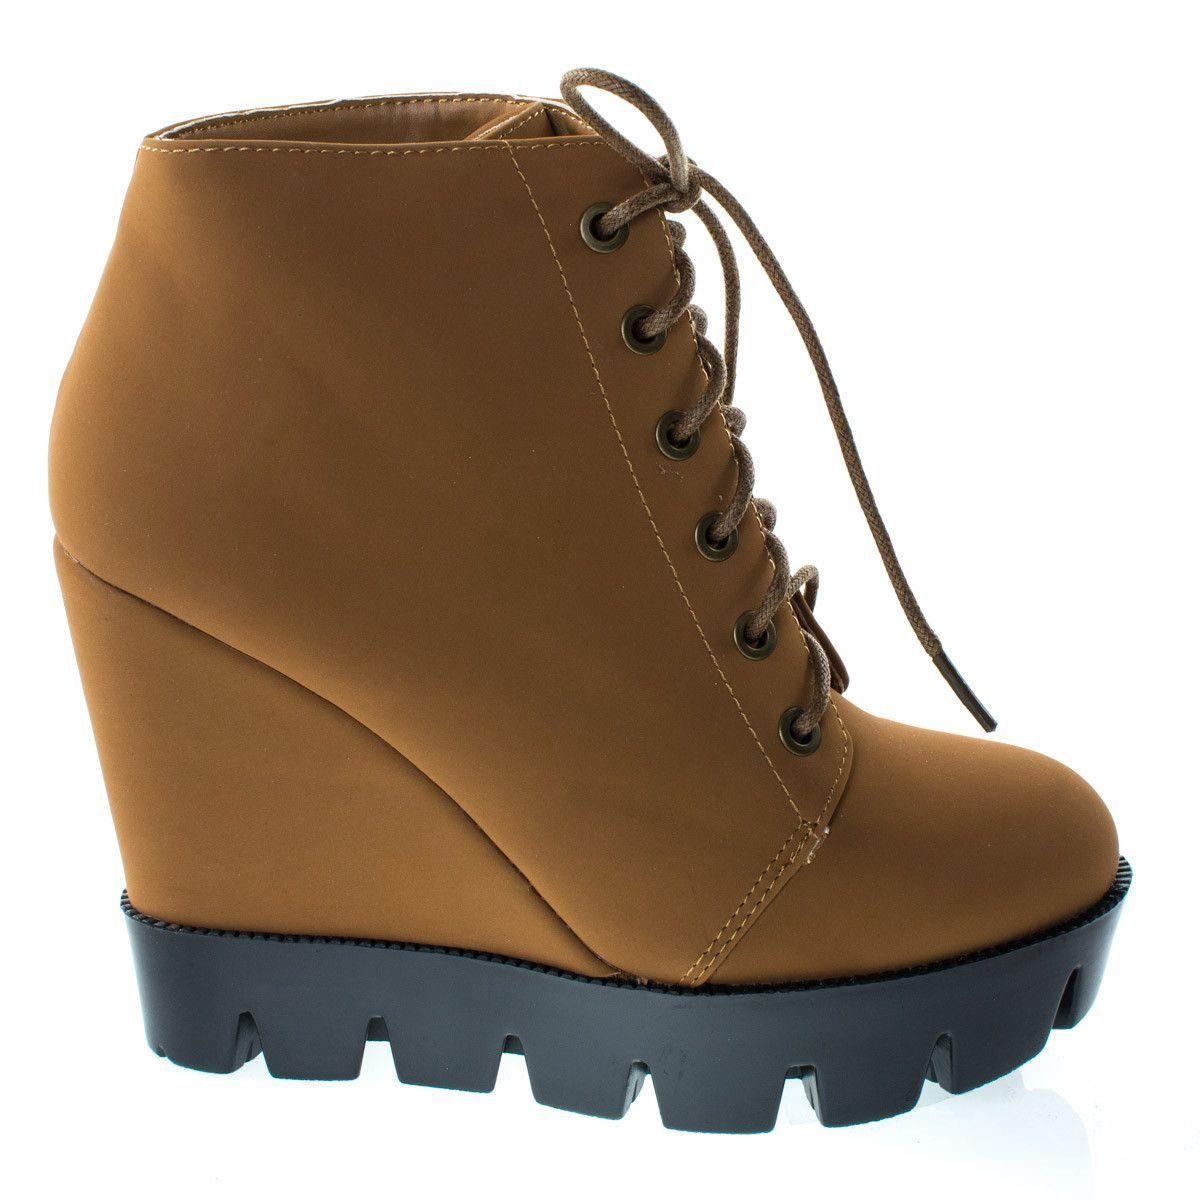 1827285042c  Tense10 Chetnut Women Faux Fur Lining Combat Ankle Boots